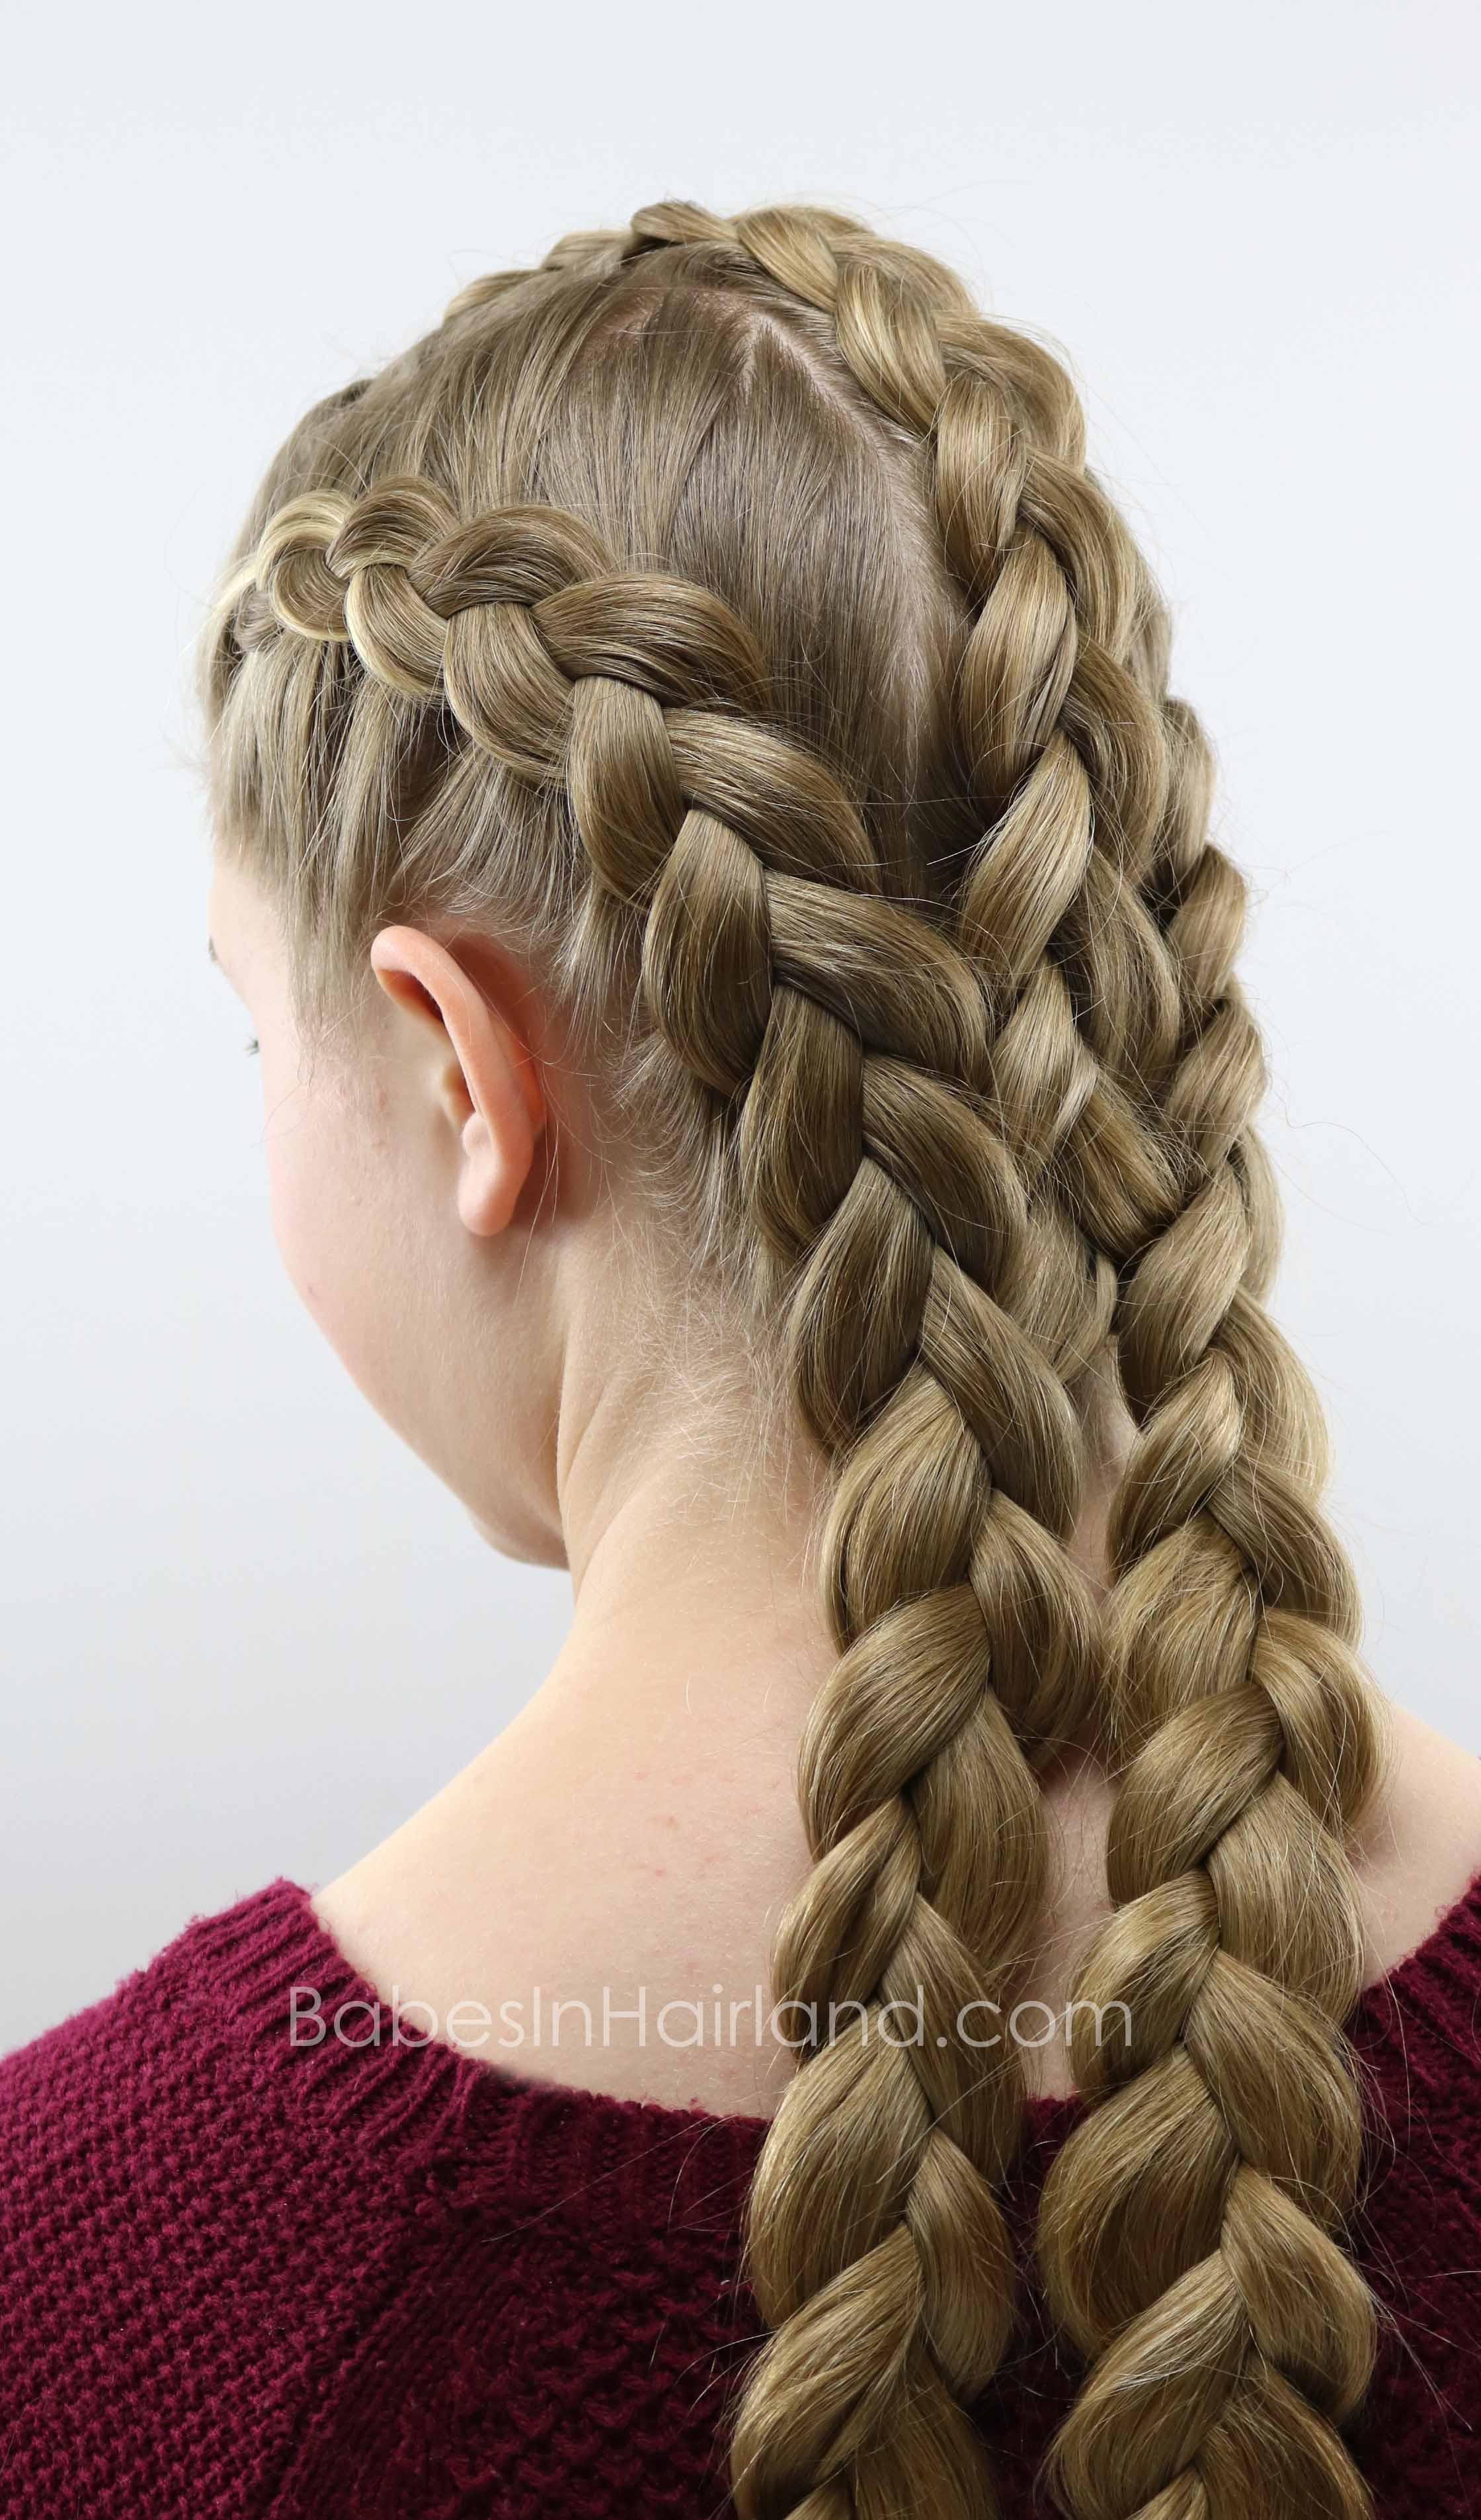 Triple Double Dutch Braids Hairstyle